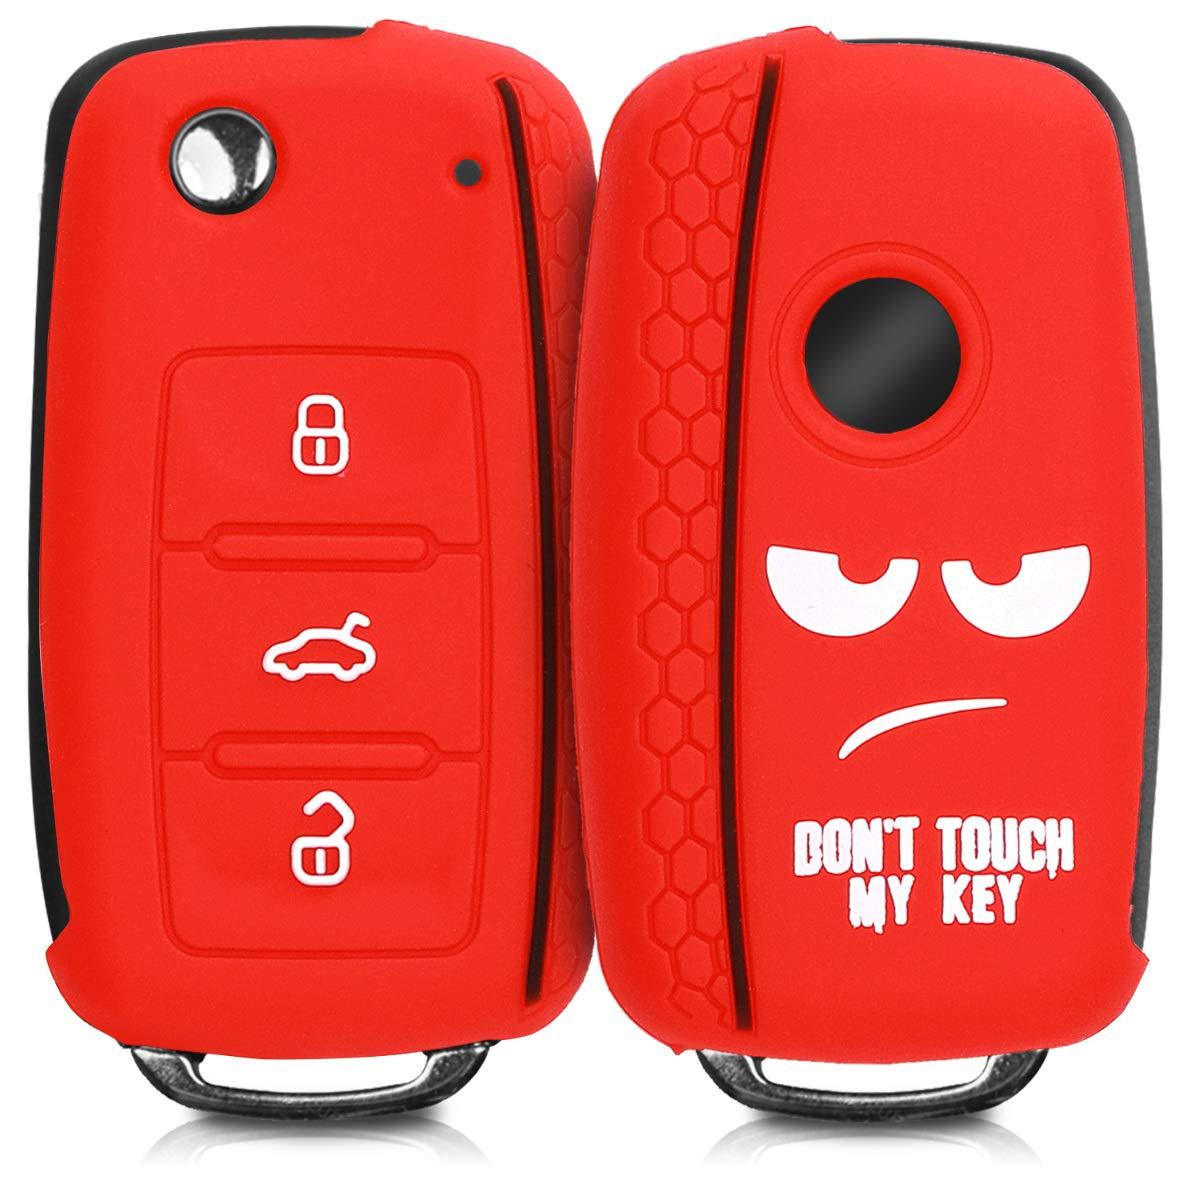 kwmobile Funda para Mando de VW Skoda Seat con dise/ño dise/ño Dont Touch my Key Carcasa para Llave del Coche Llave de 3 Botones para Coche VW Skoda Seat